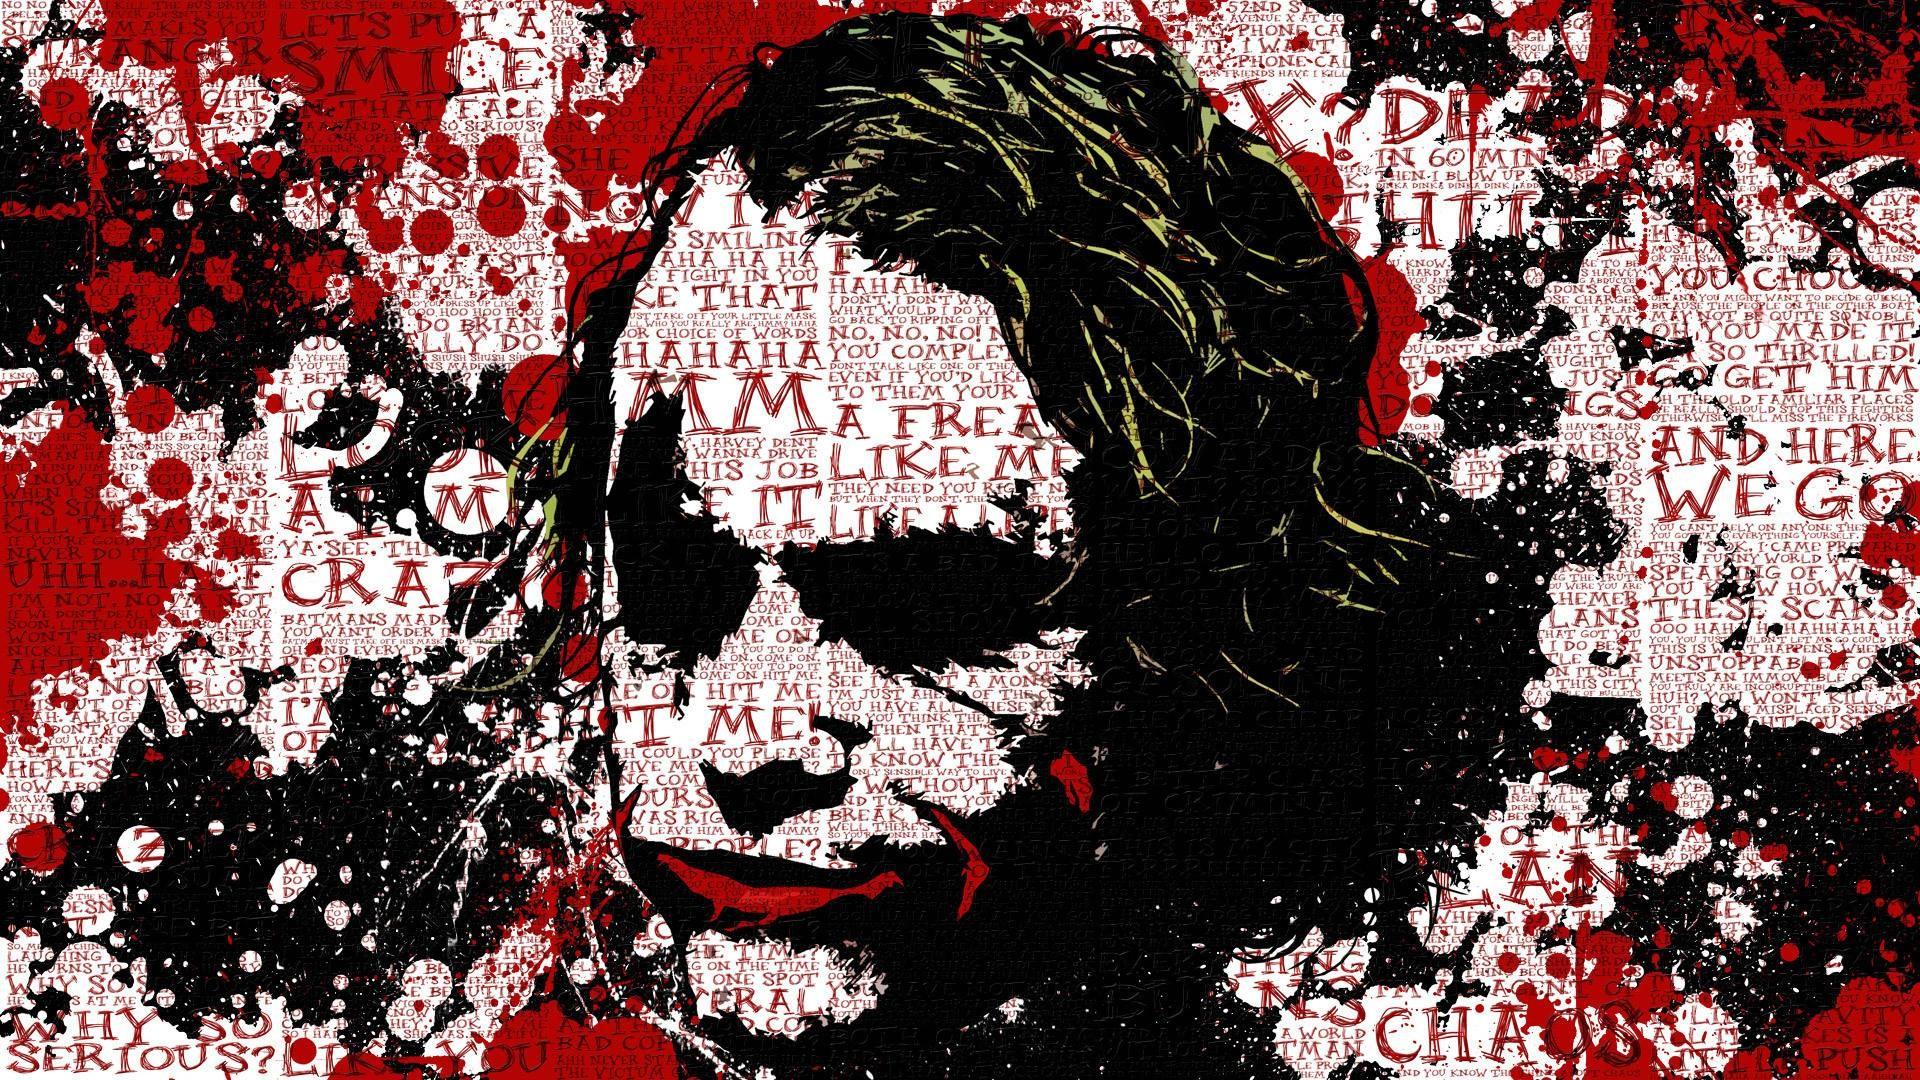 Batman Joker Quotes Mobile Wallpaper Joker Background 183 ① Download Free Awesome Full Hd